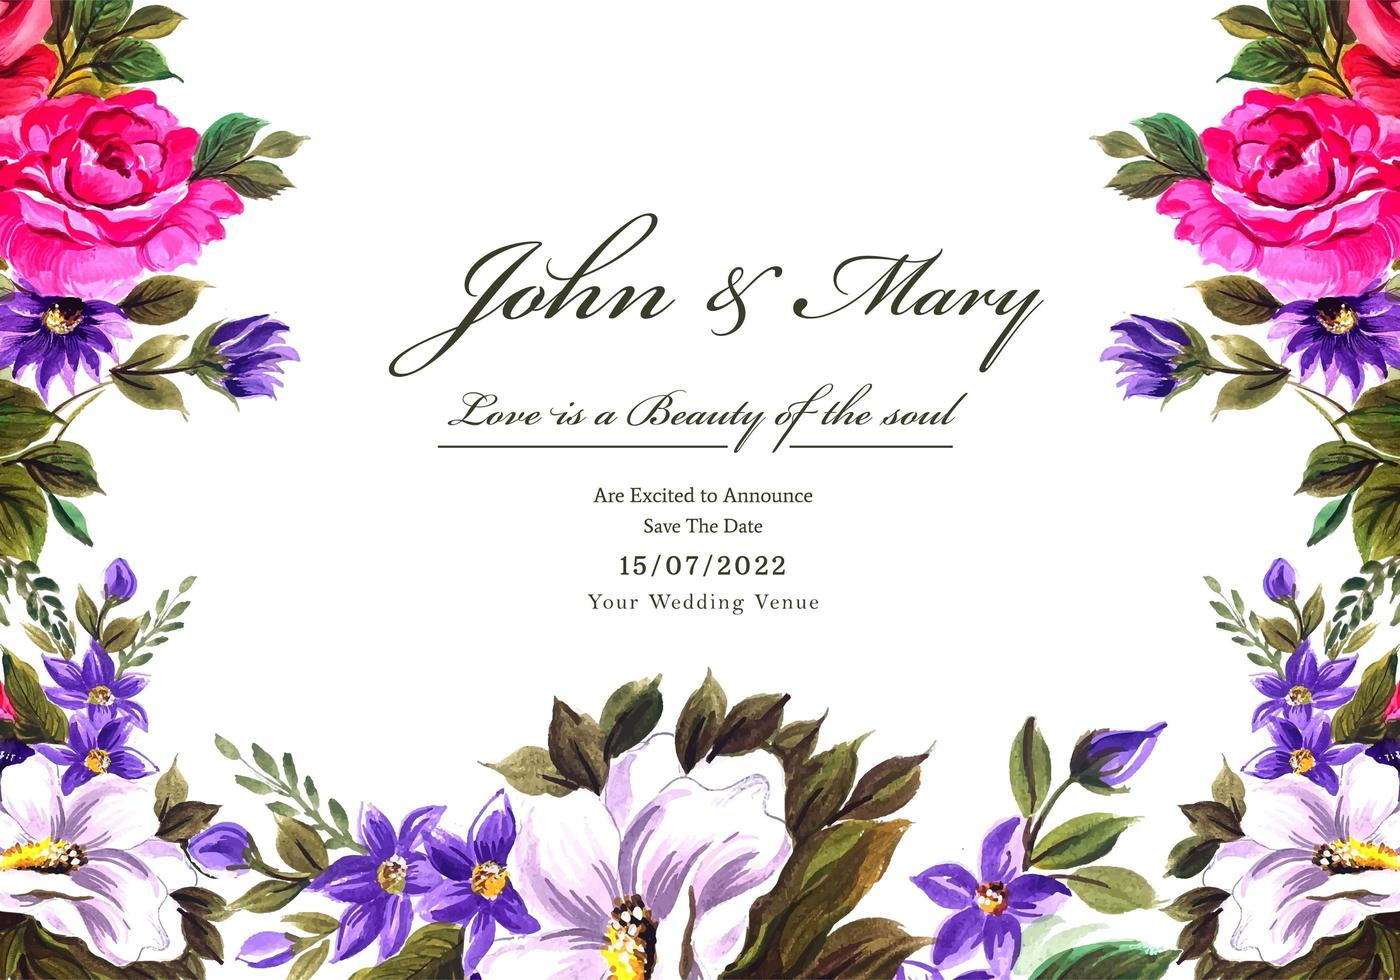 Wedding decorative flowers frame card vector